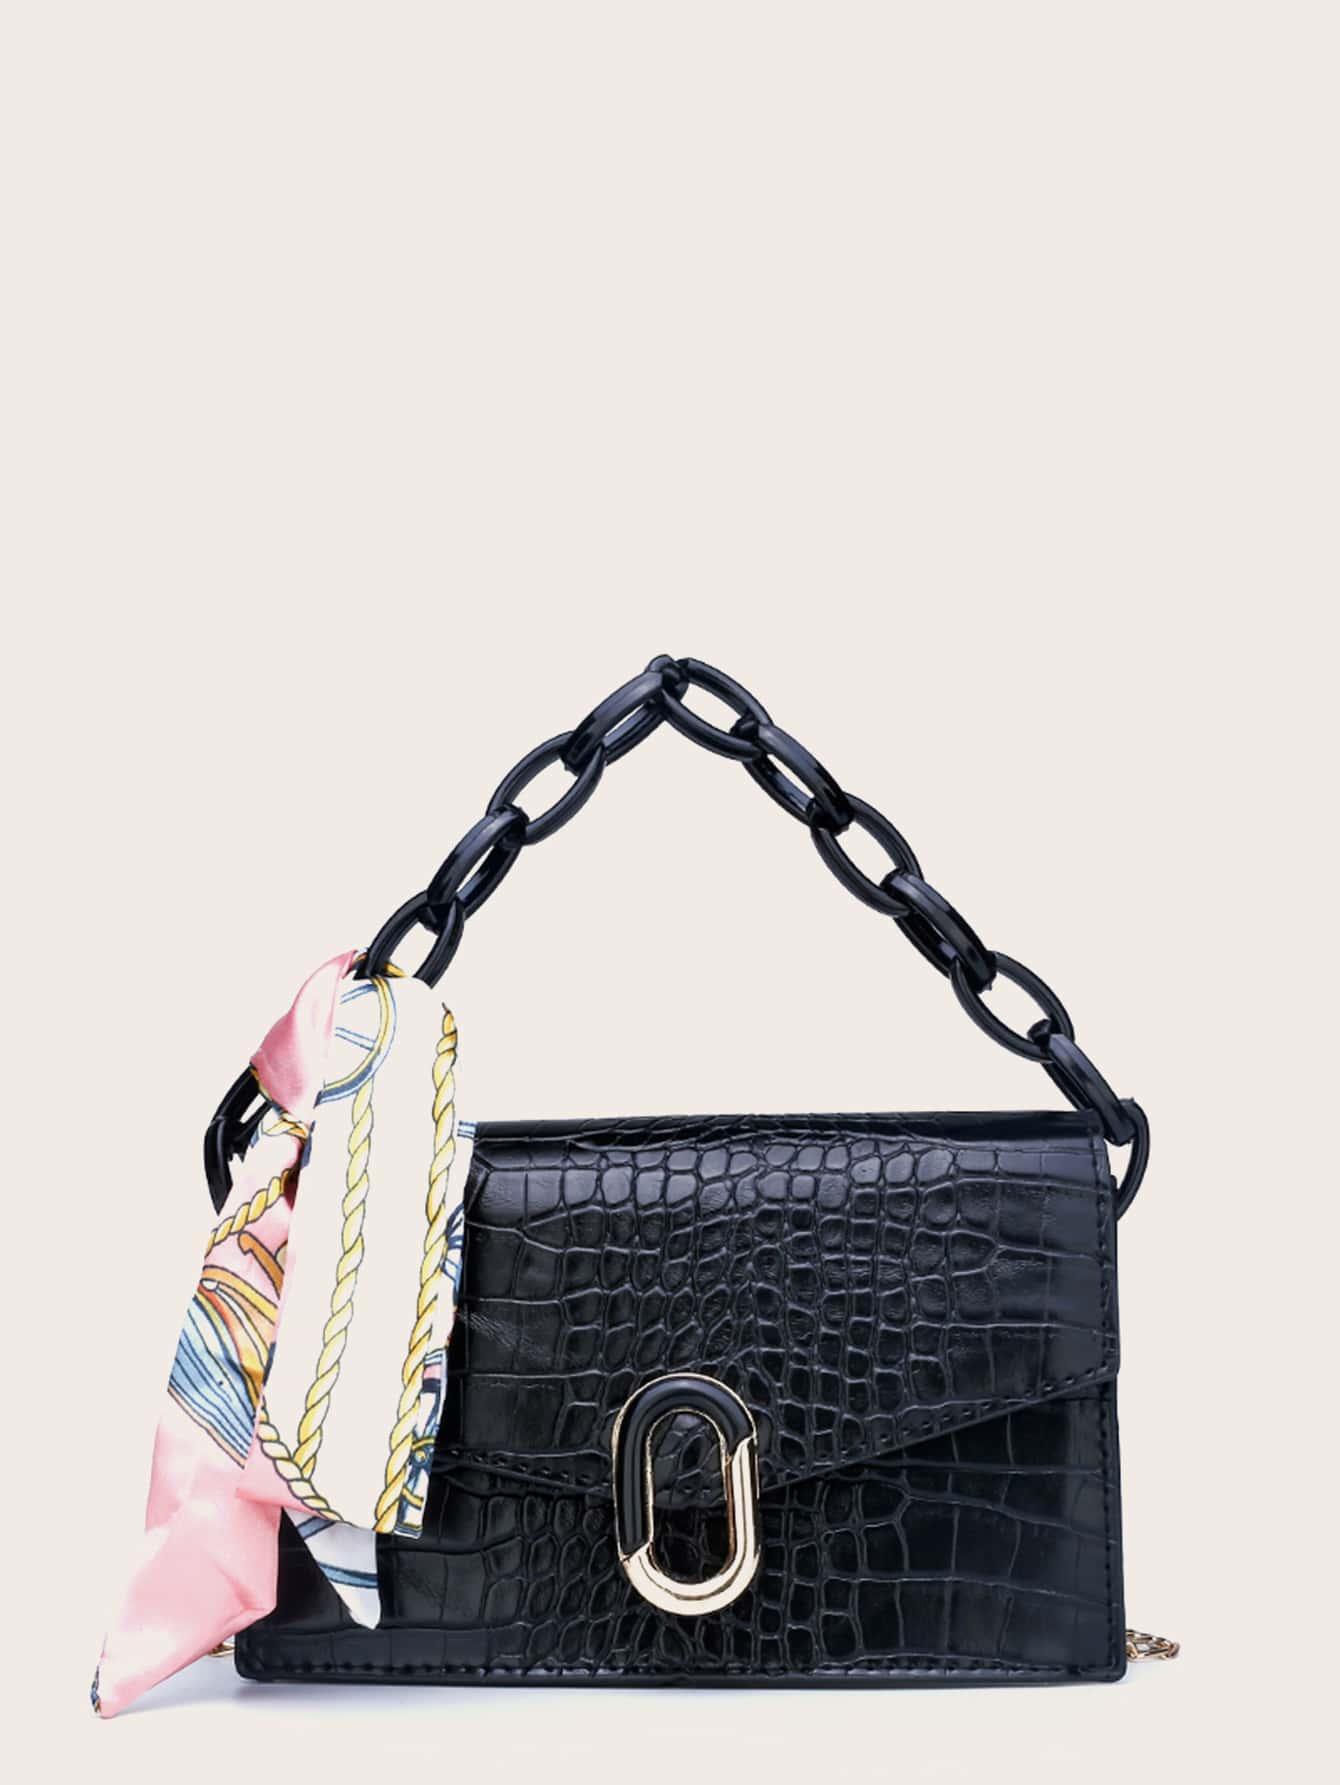 twilly scarf decor croc embossed satchel bag